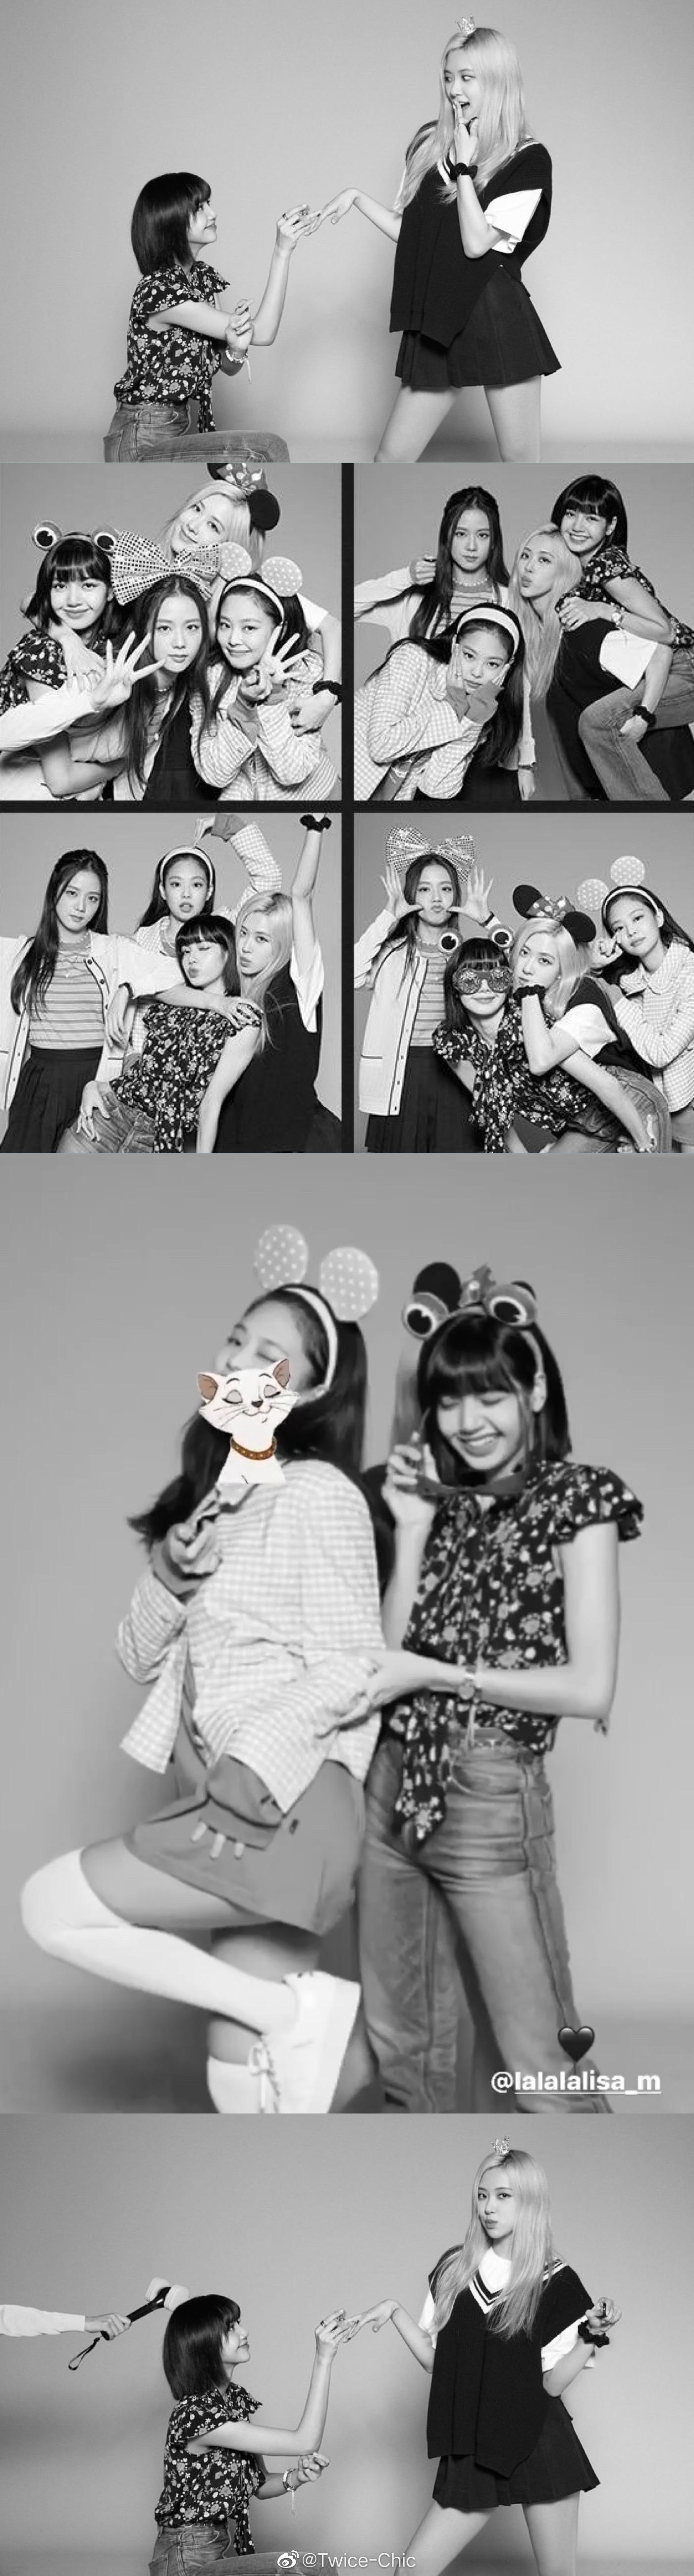 BLACKPINK Girl's Day 姜涩琪 崔秀英 金泫雅&金晓钟 李先彬 丁海寅